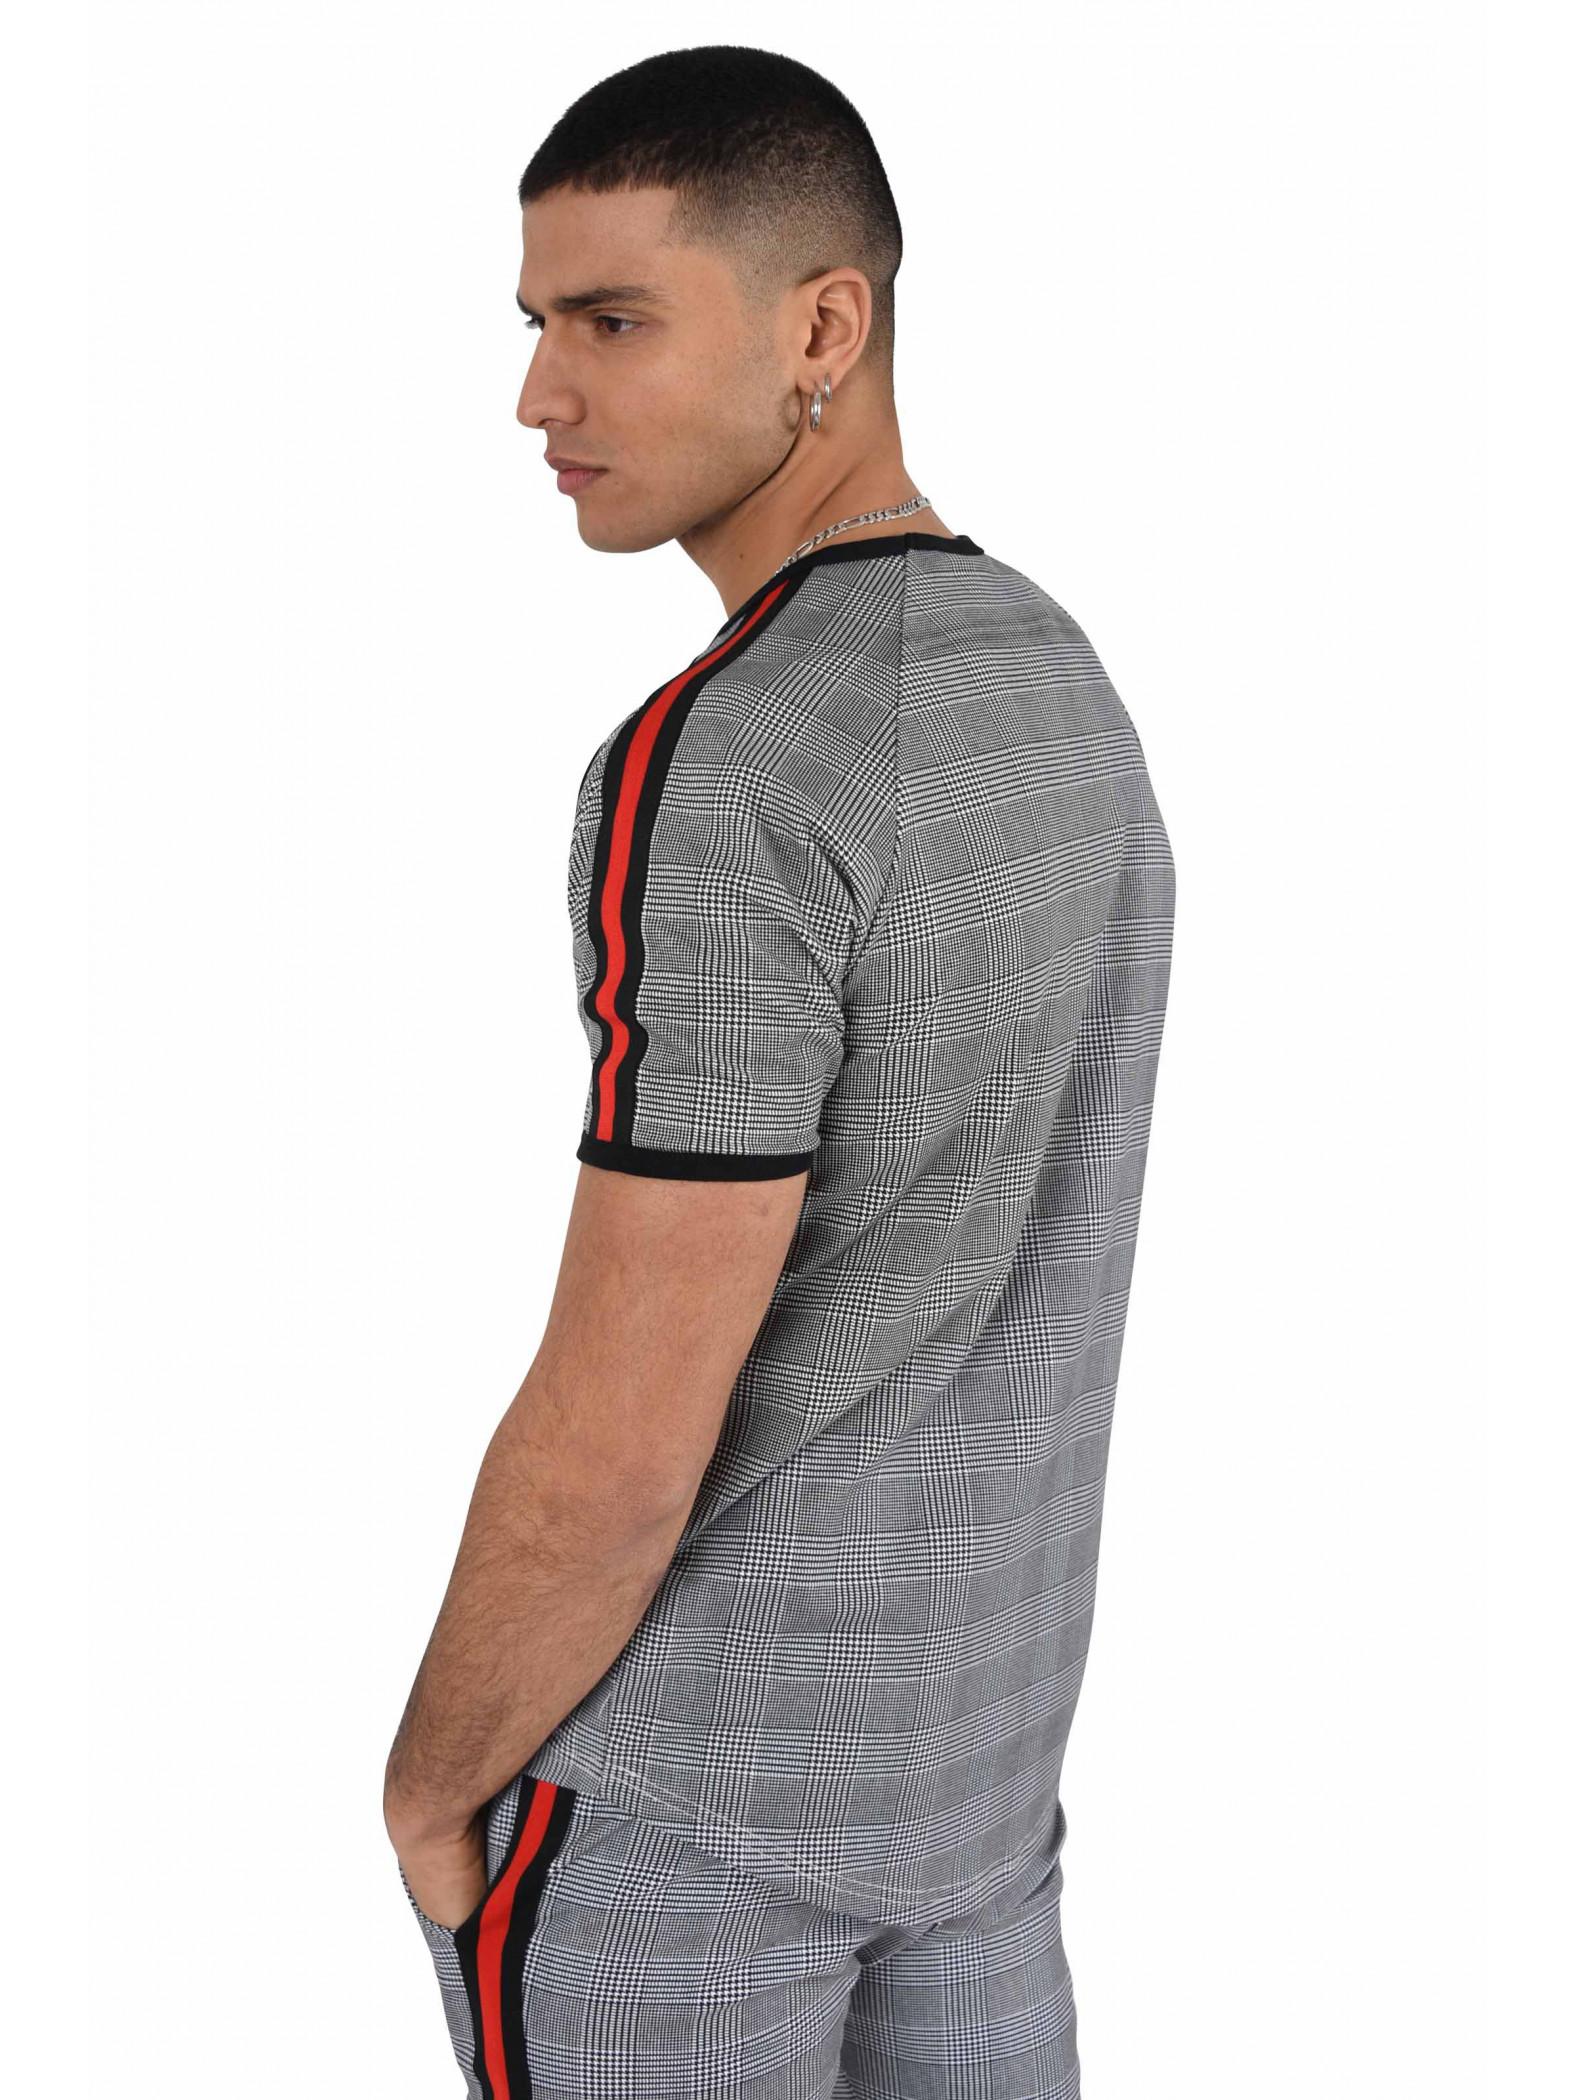 6c8389633854c Houndstooth Tee shirt Project X Paris